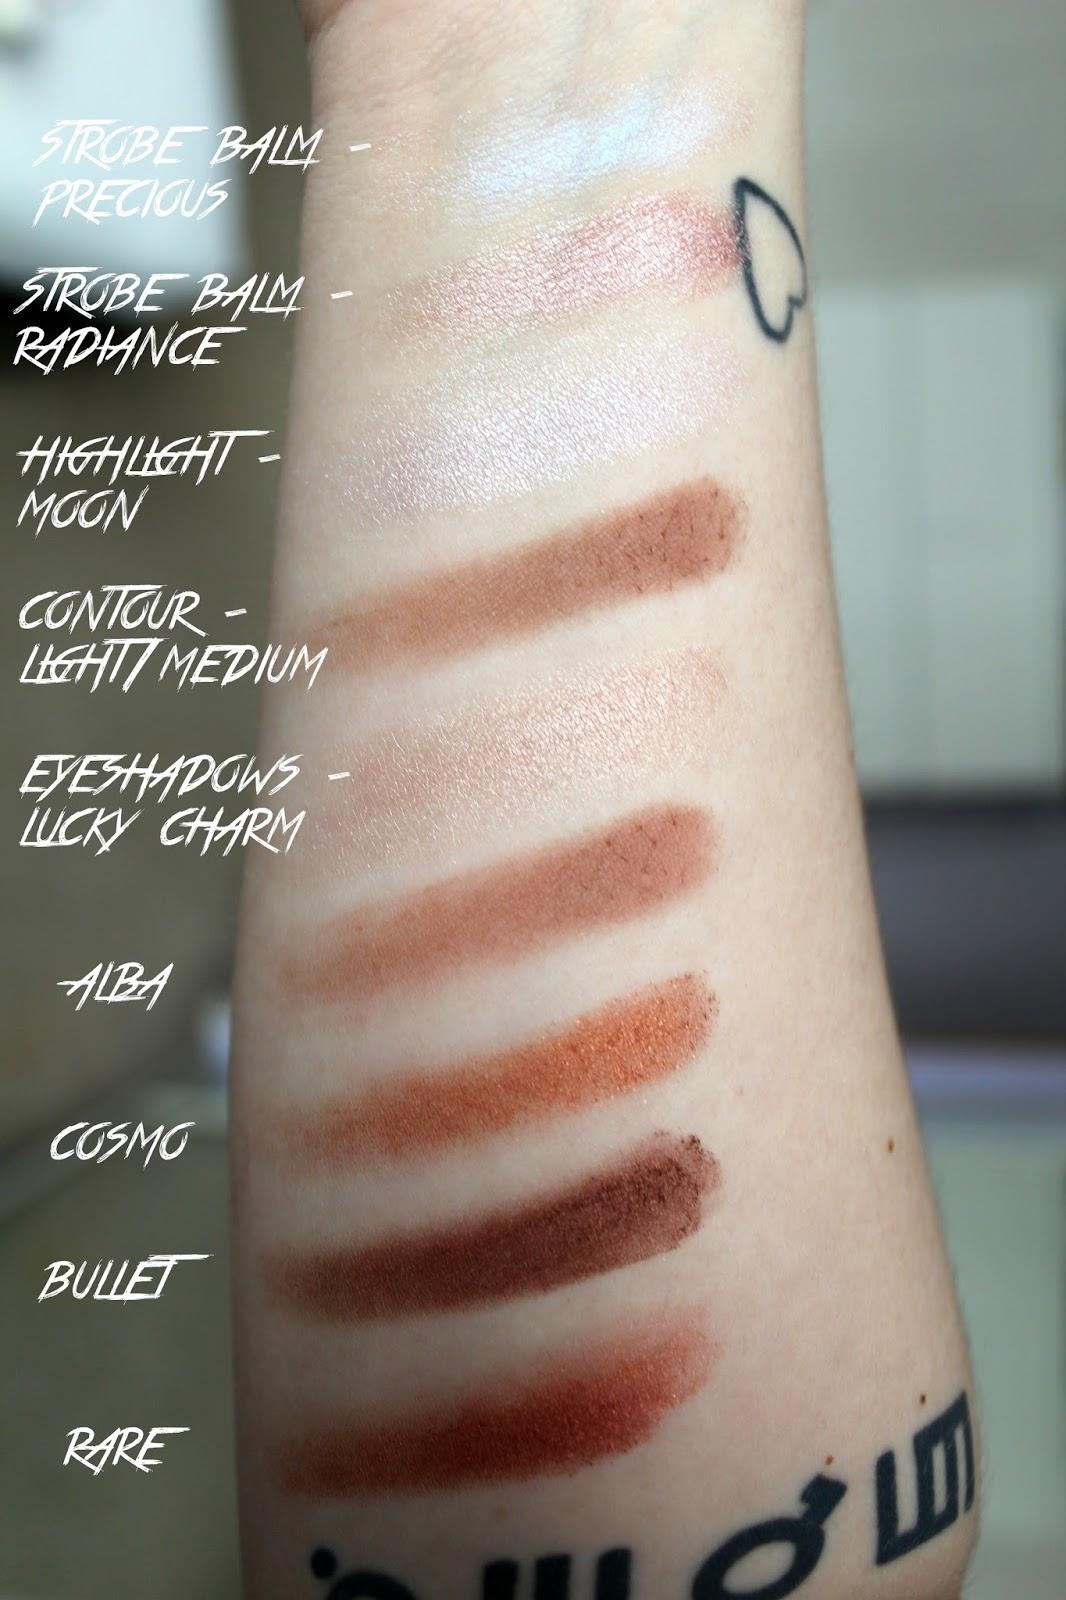 makeup obsession, custom palette, what's in my makeup obsession palette, swatches, reviews, cosmo, bullet, rare, alba, lucky charm, highlight powder, strobe cream, precious, moon, radiance, contour powder, light medium